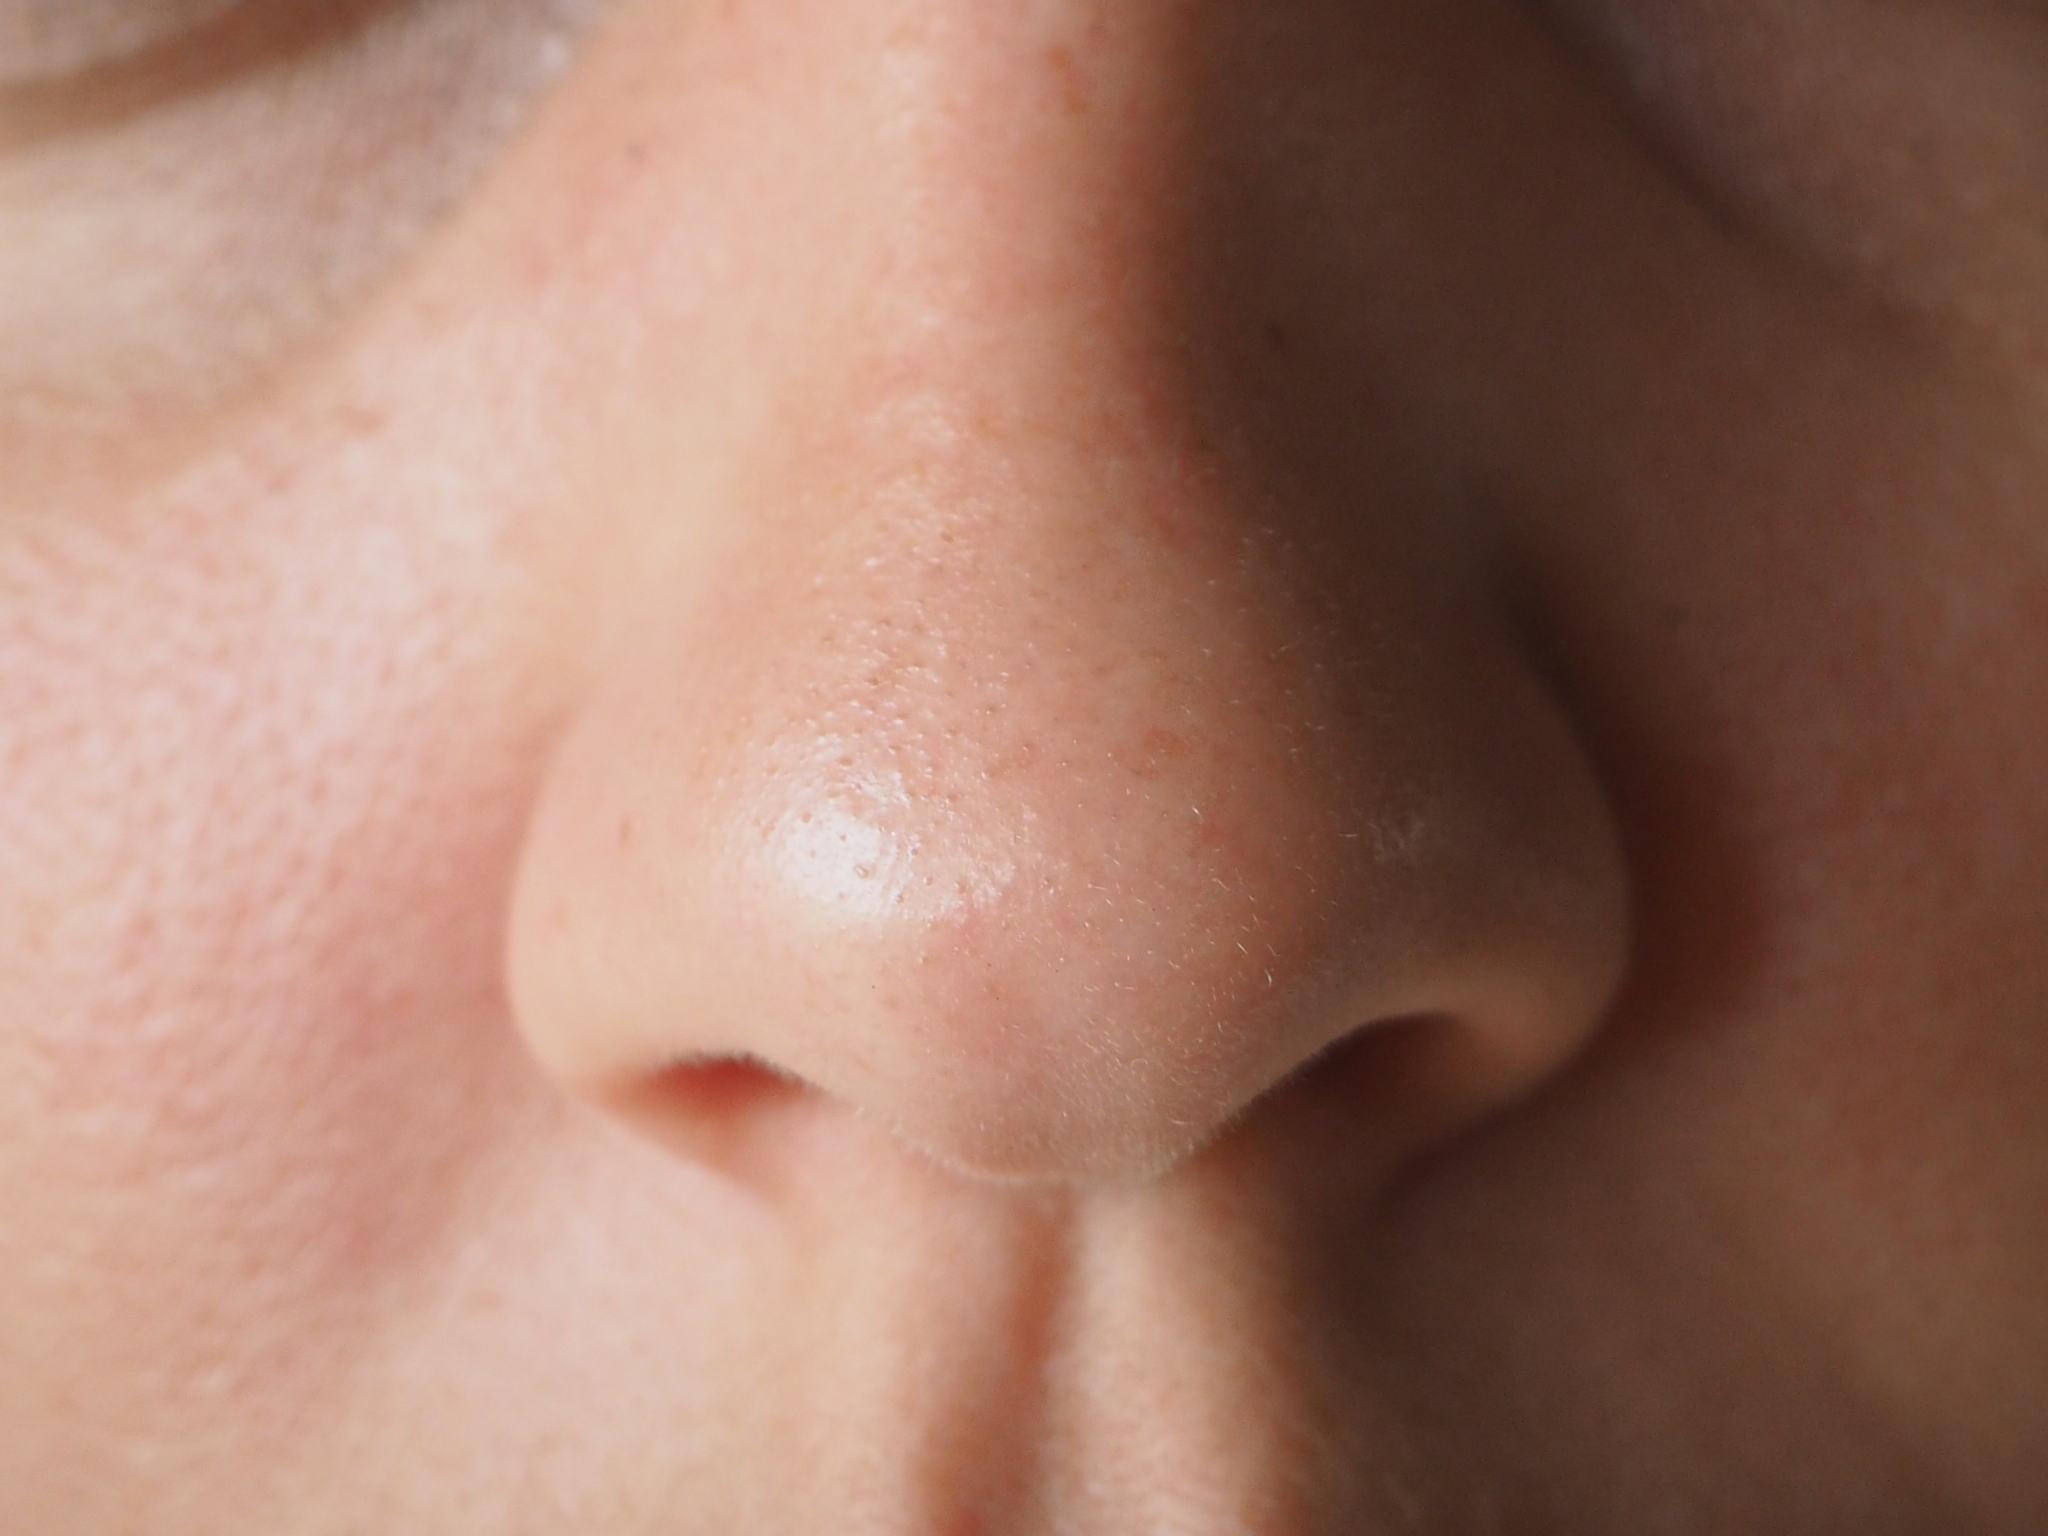 elizavecca-skincare-hella-pore-clean-up-face-mask-before